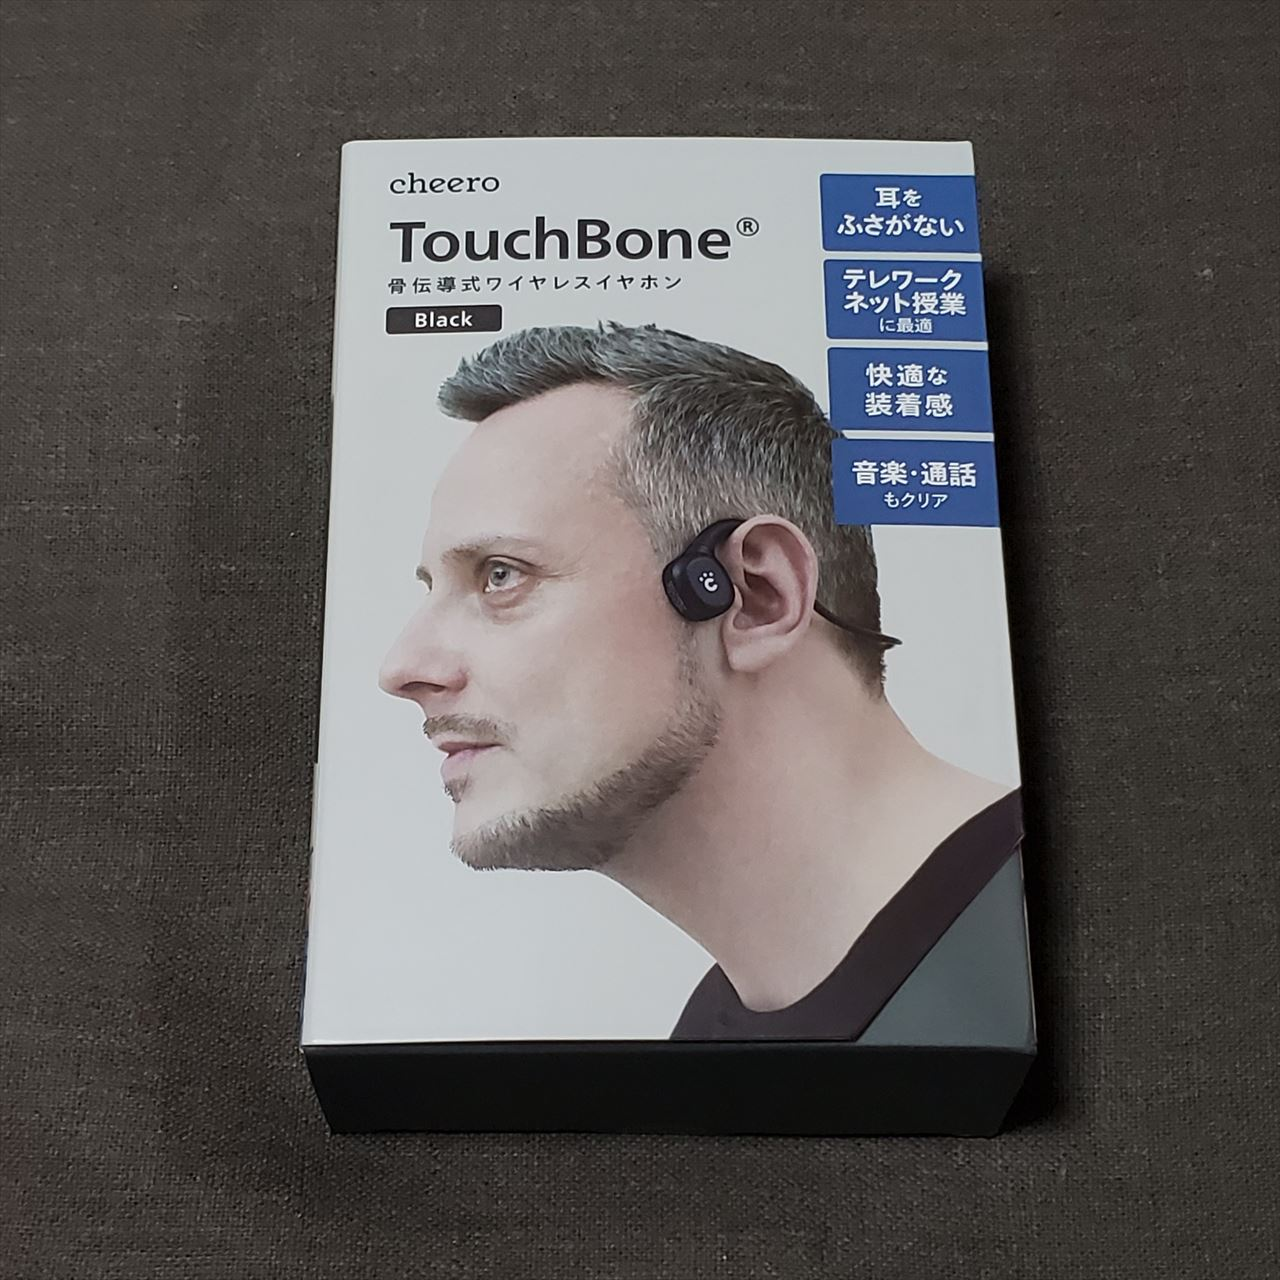 TouchBone箱